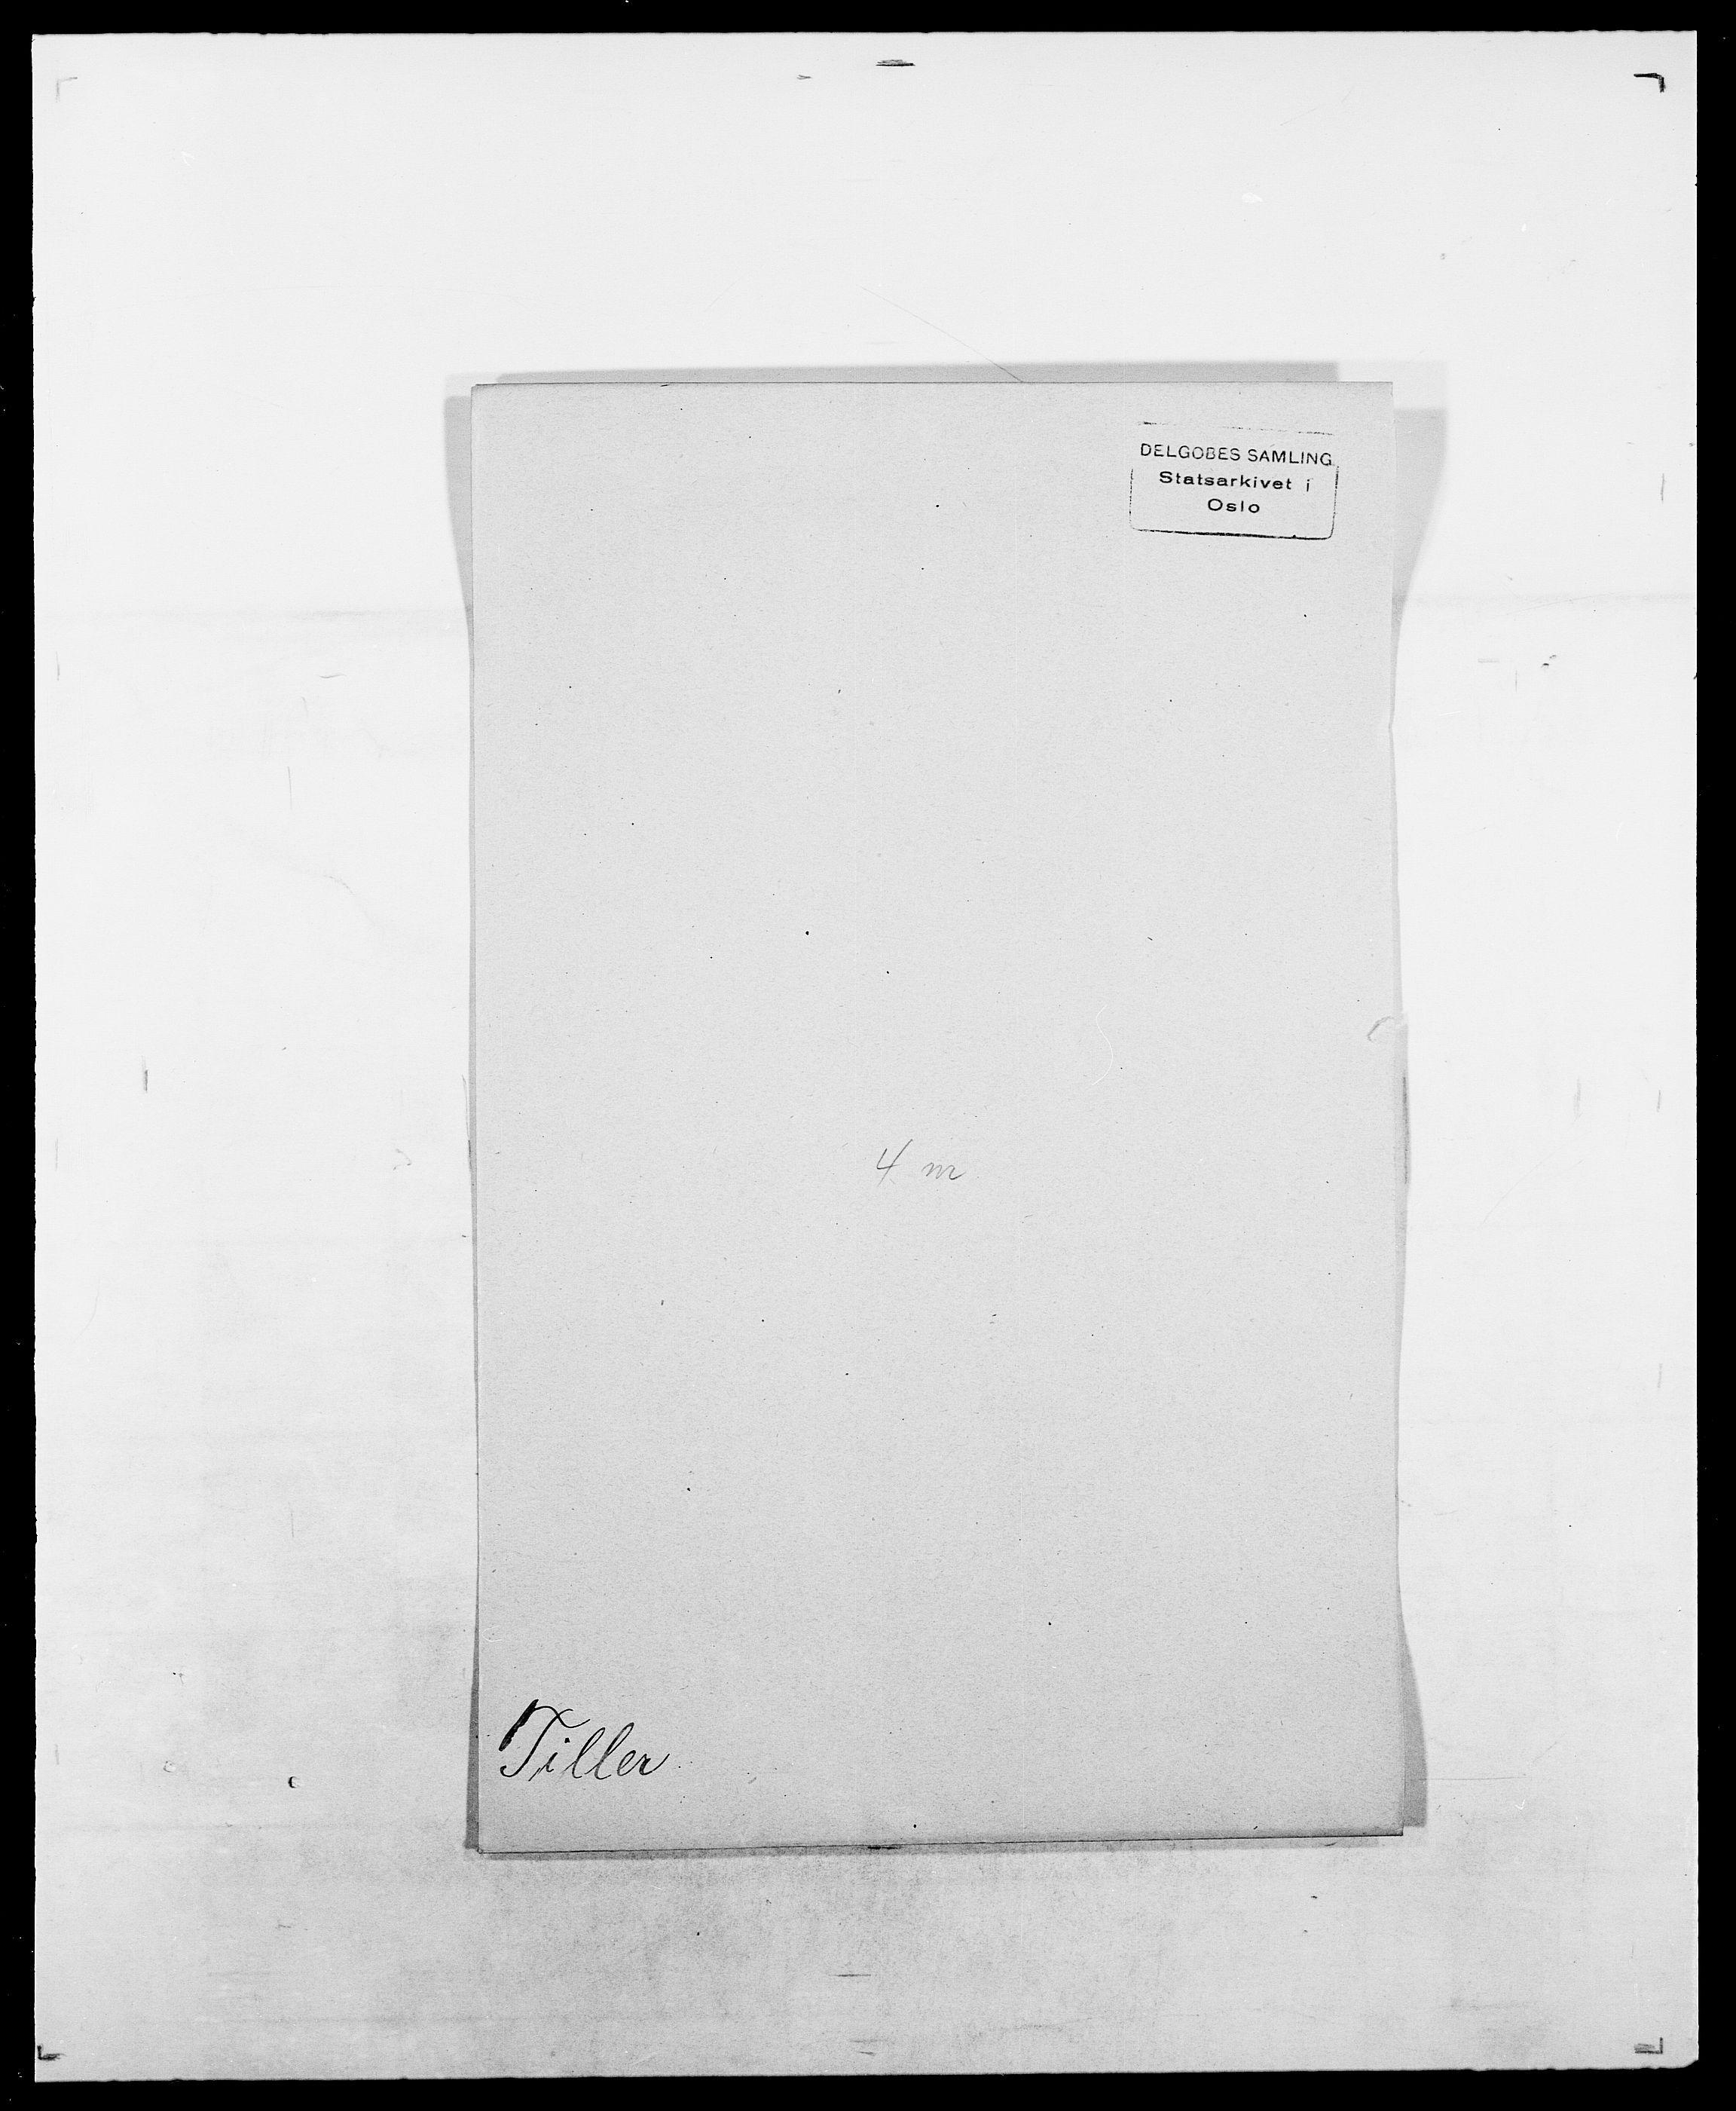 SAO, Delgobe, Charles Antoine - samling, D/Da/L0039: Thorsen - Urup, s. 36